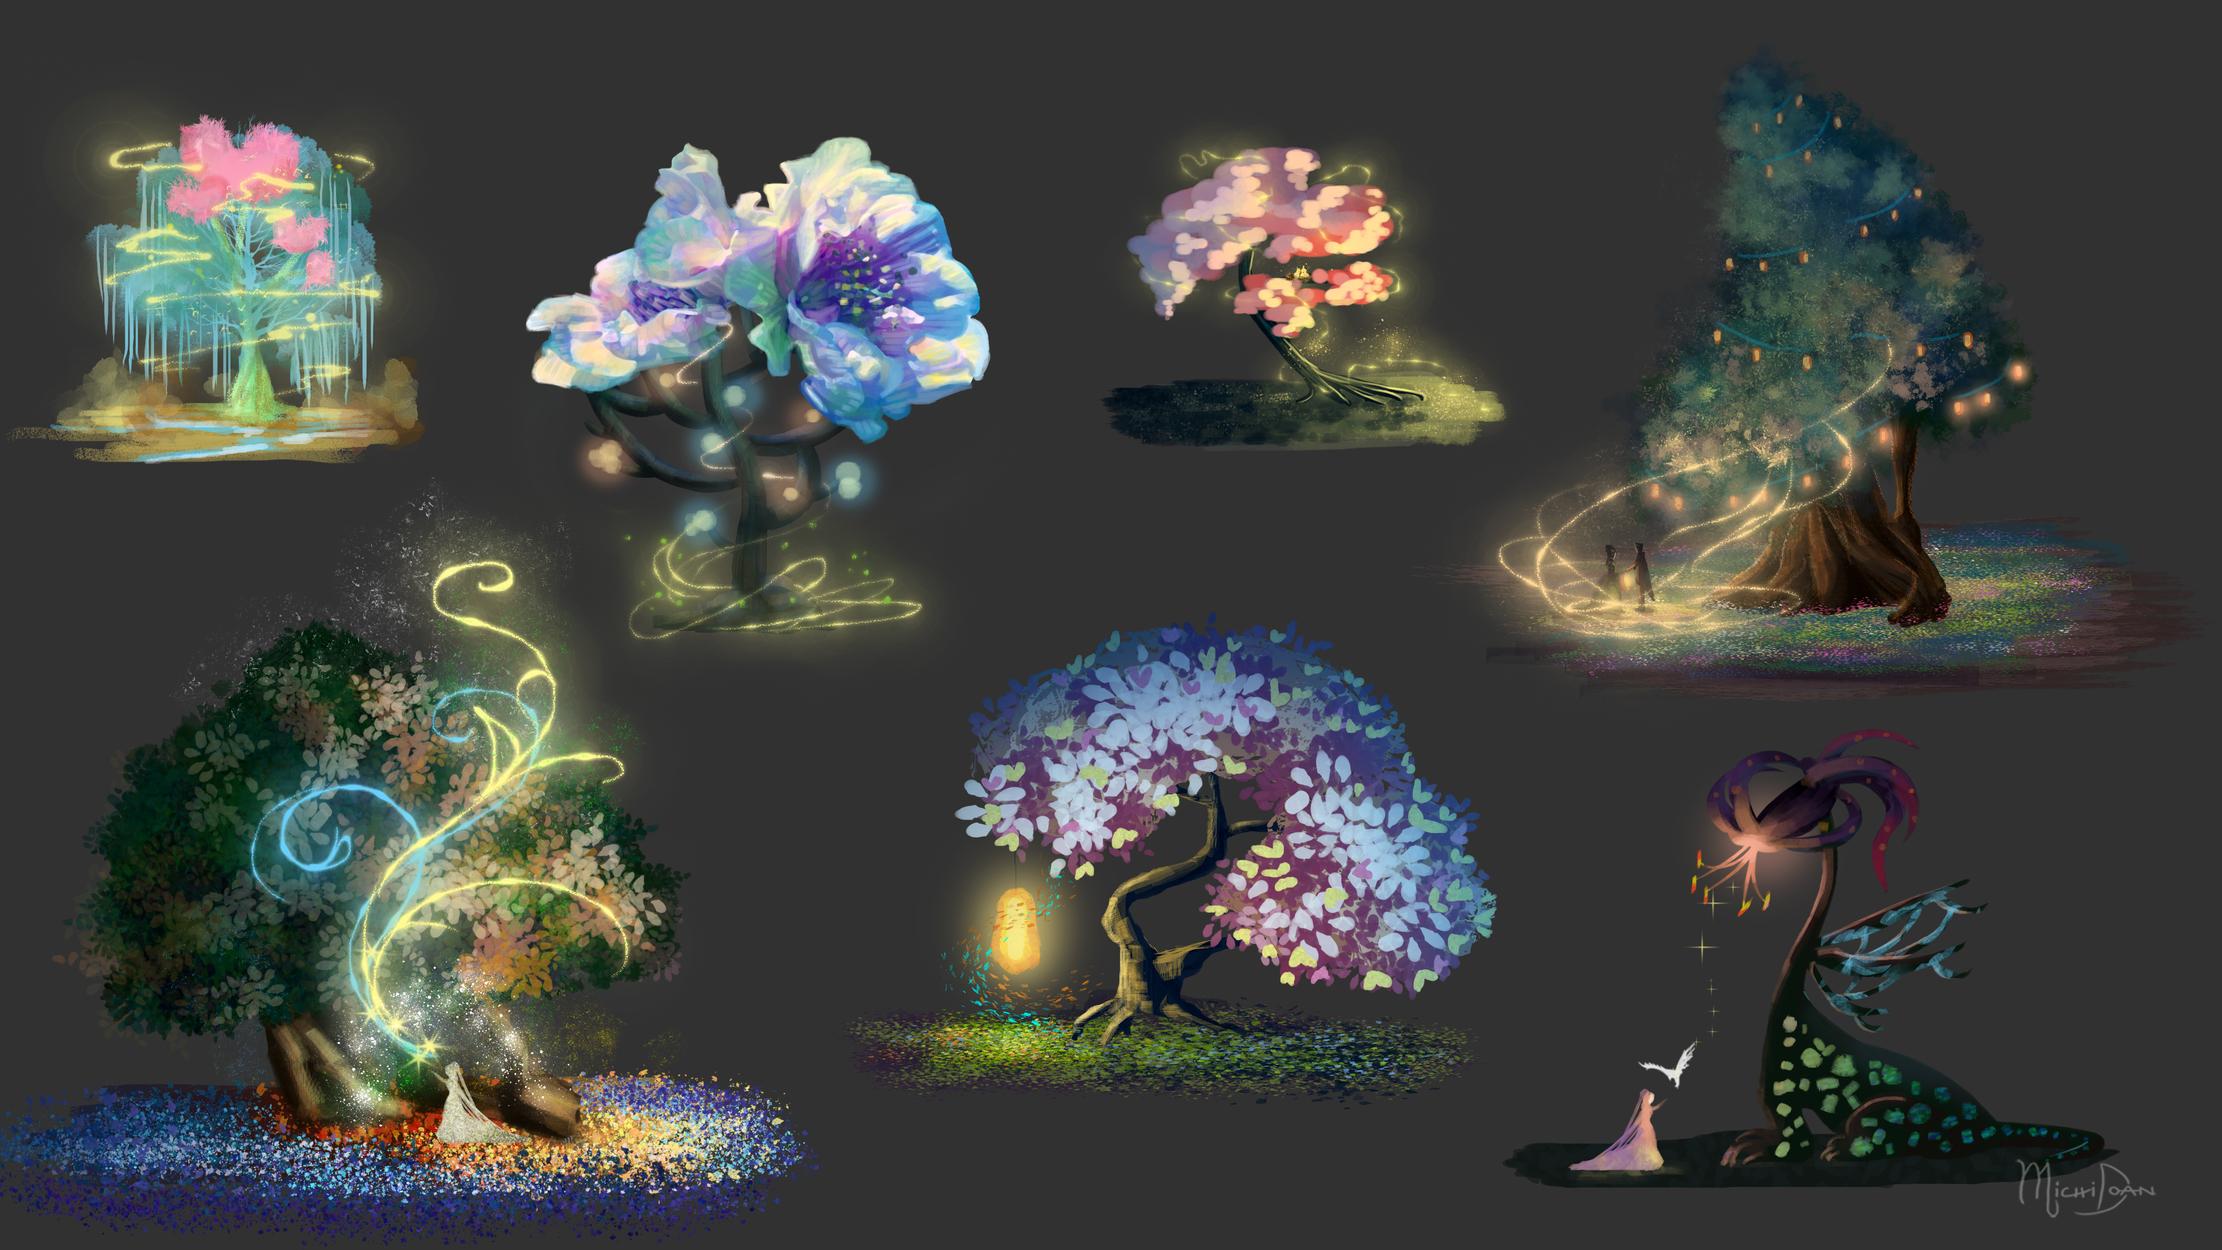 Enchantsia Magic Trees Artwork by Michi Doan